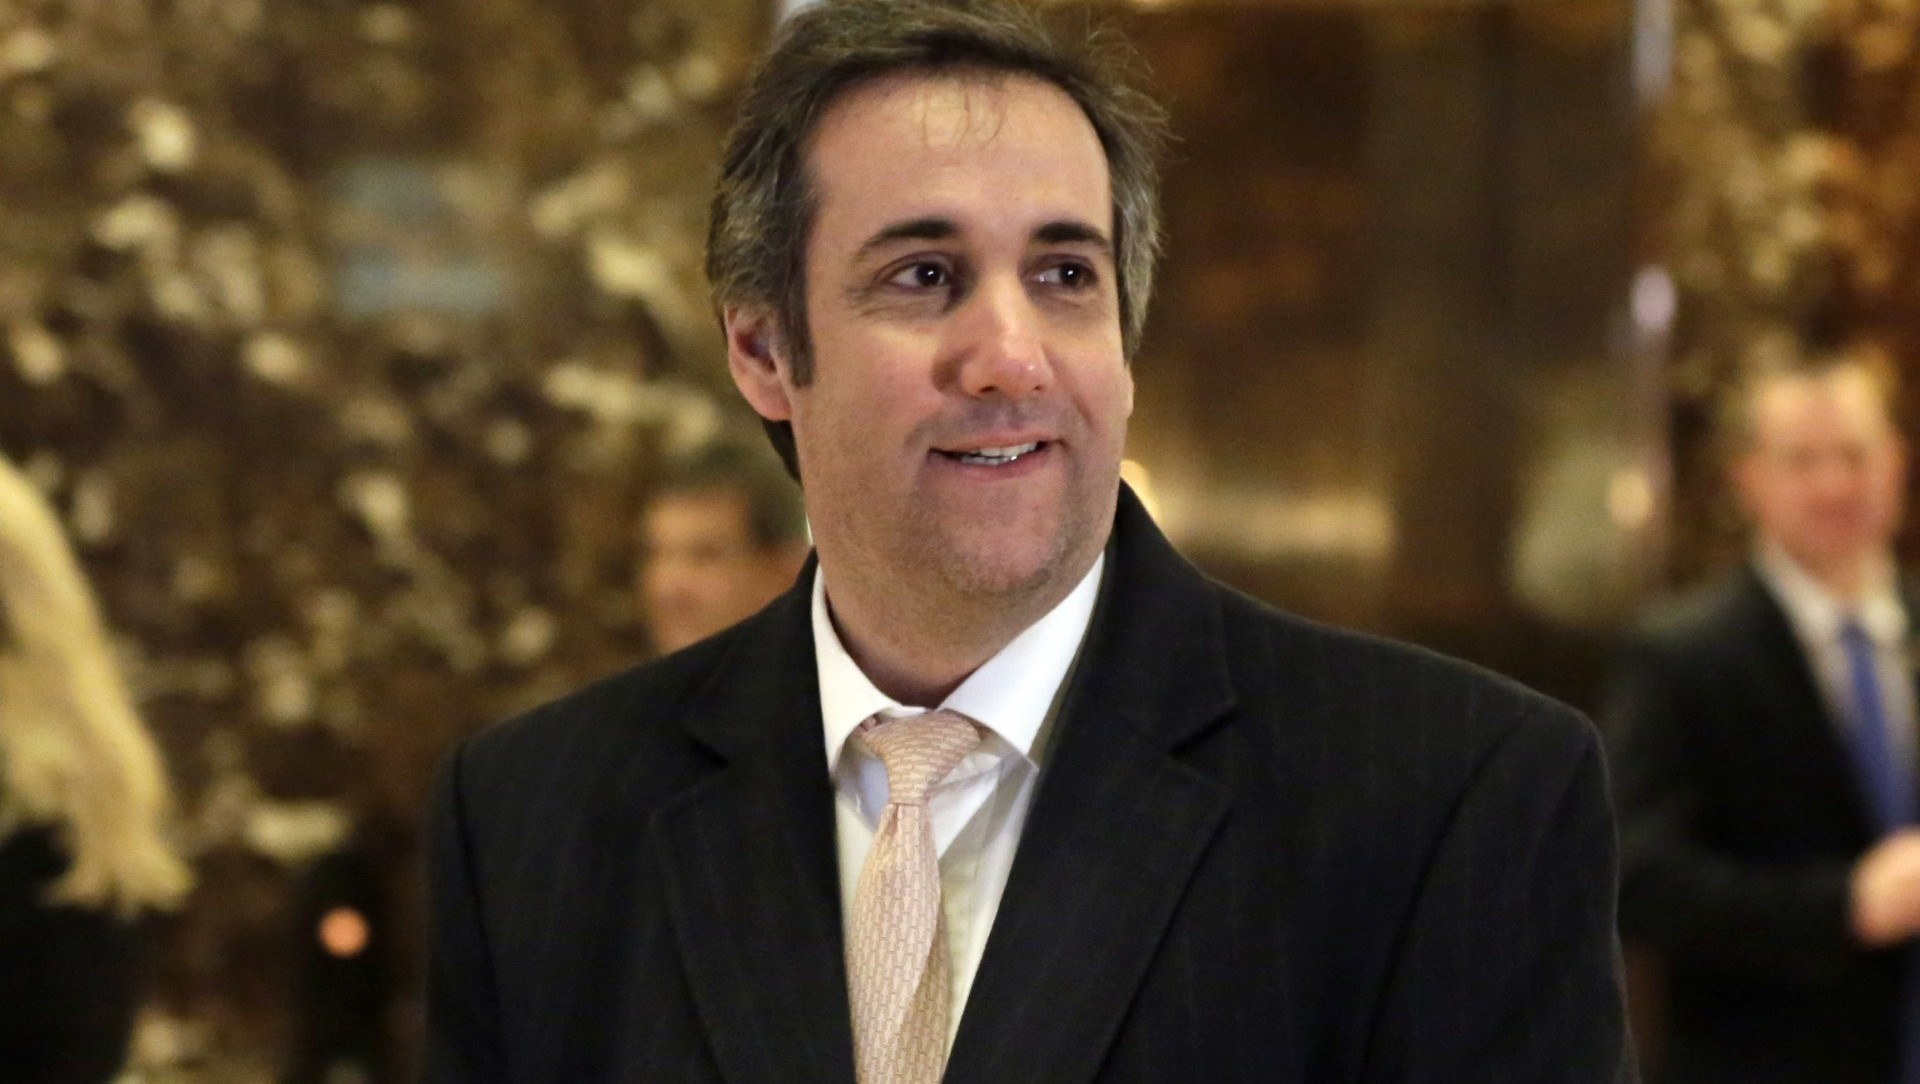 El abogado de Donald Trump, Michael Cohen (AP /Richard Drew, archivo)